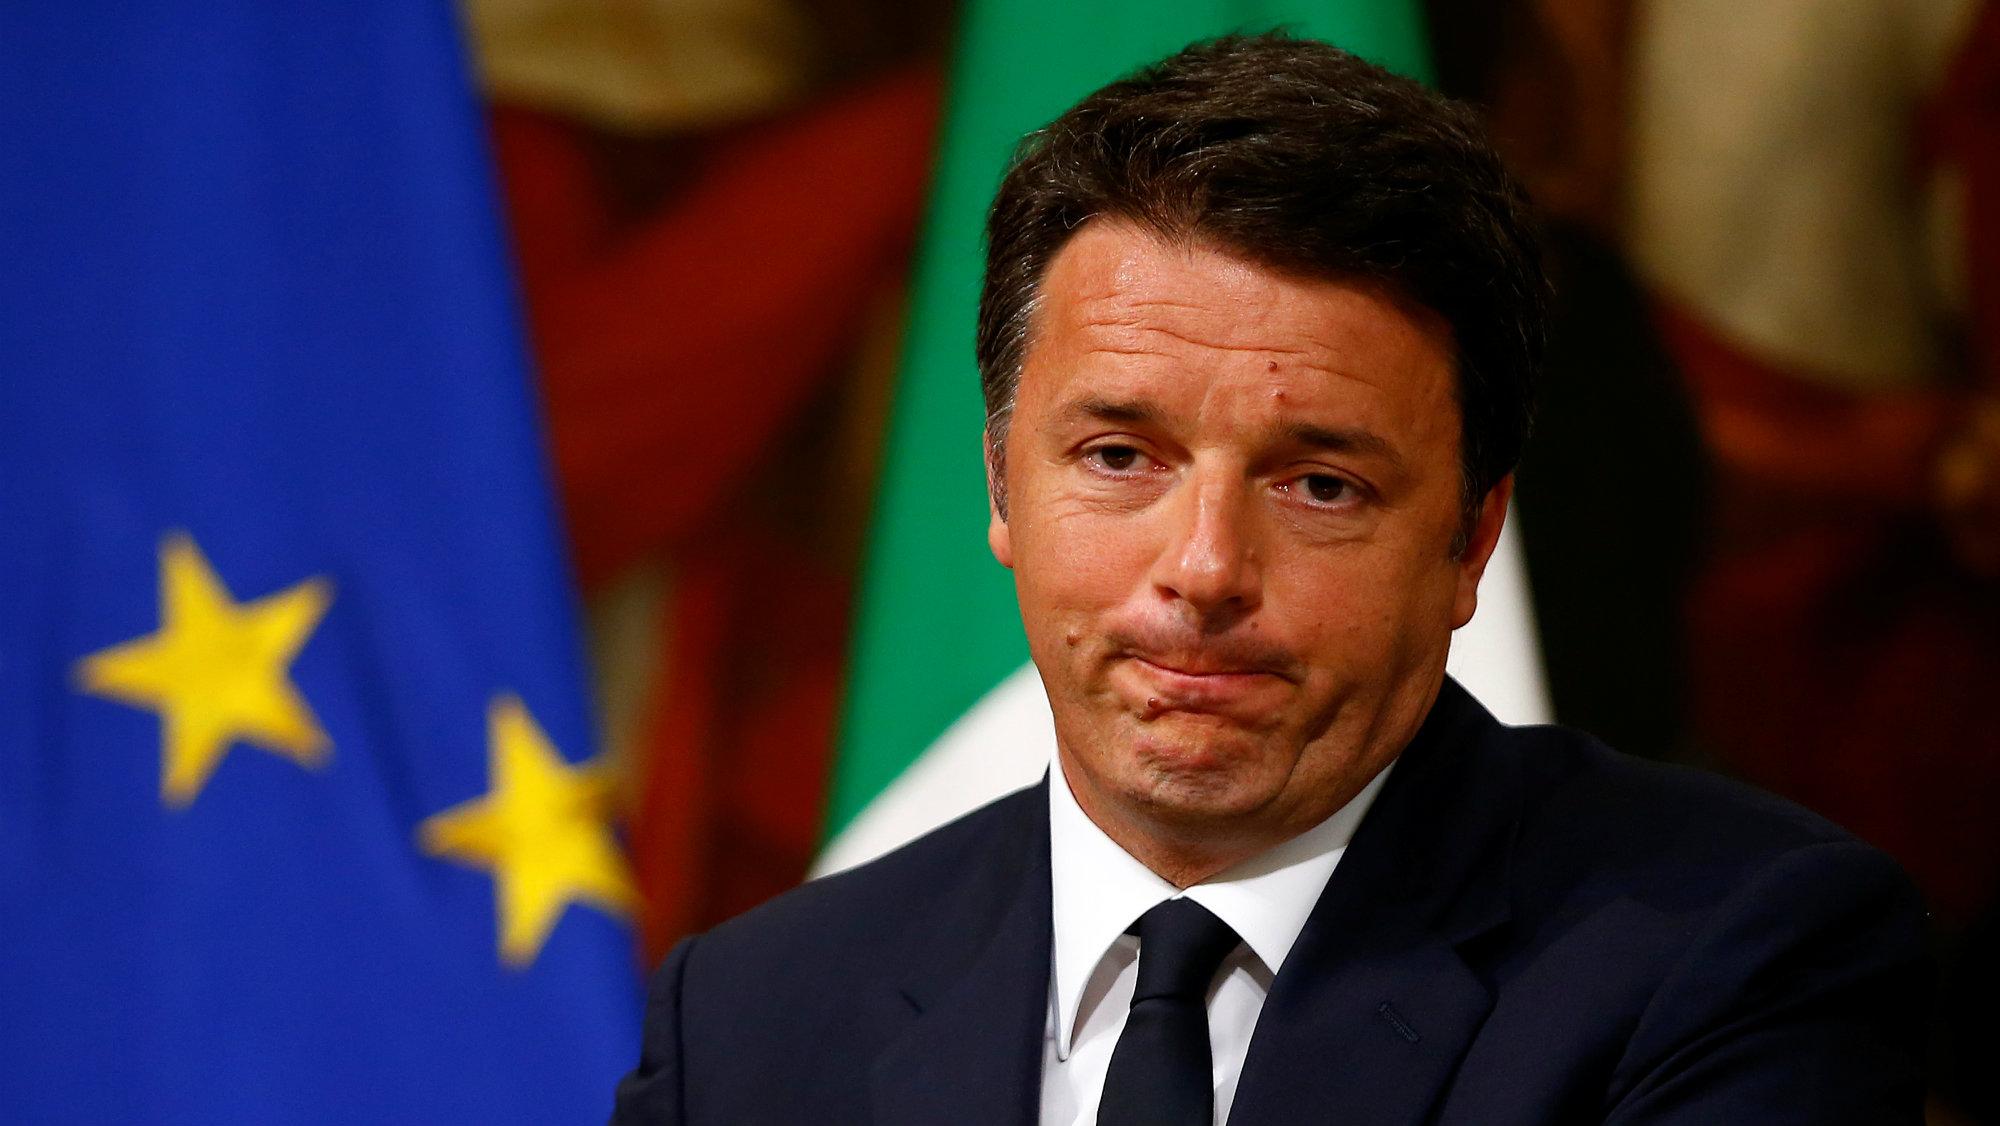 Italian Prime Minster Matteo Renzi